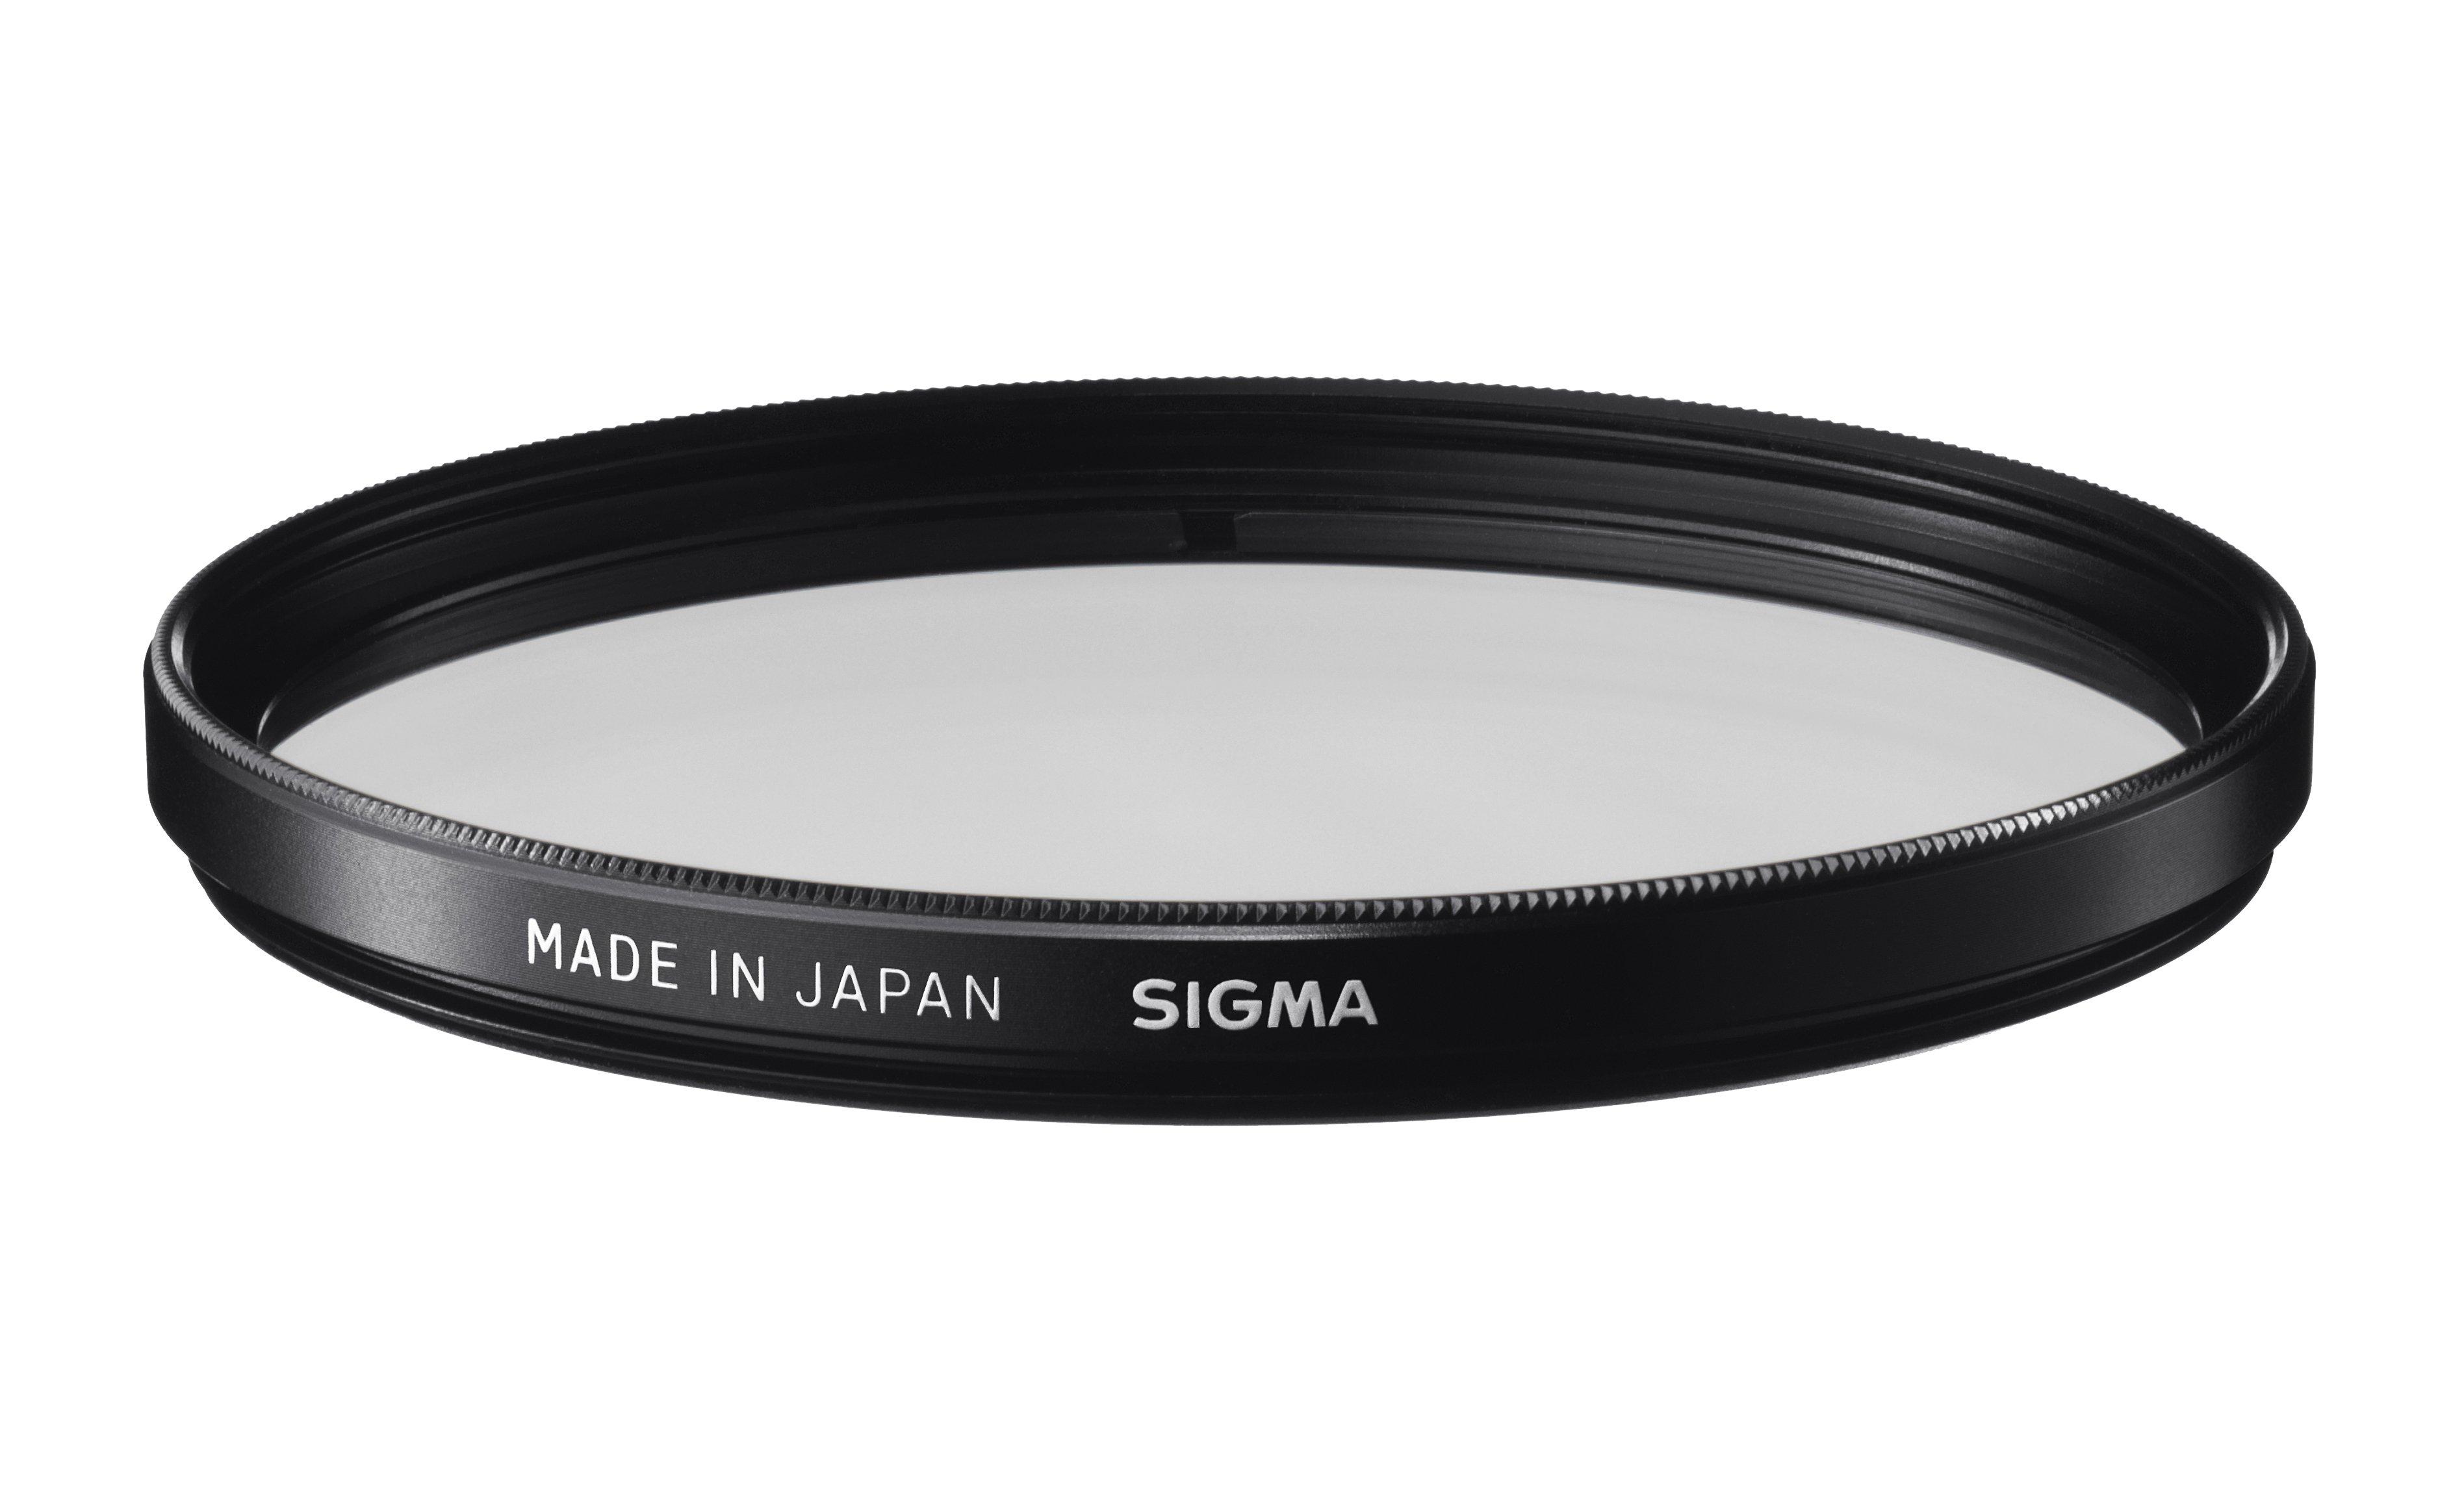 SIGMA filtr UV 46 mm WR